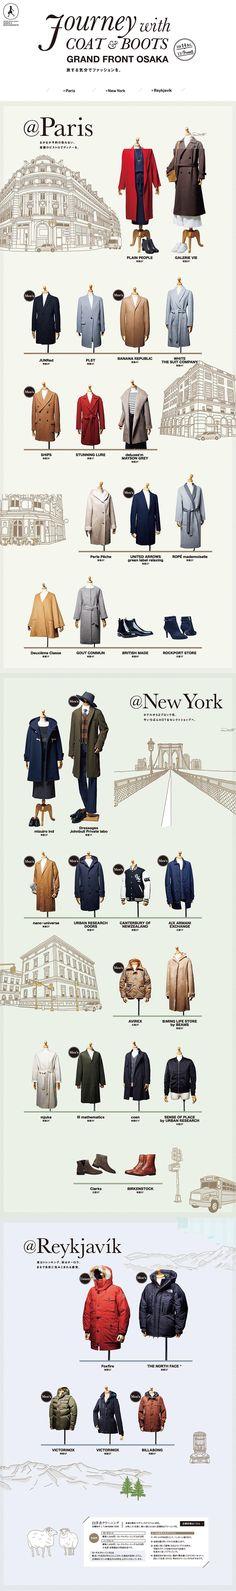 Journey with COAT & BOOTS【ファッション関連】のLPデザイン。WEBデザイナーさん必見!ランディングページのデザイン参考に(シンプル系)